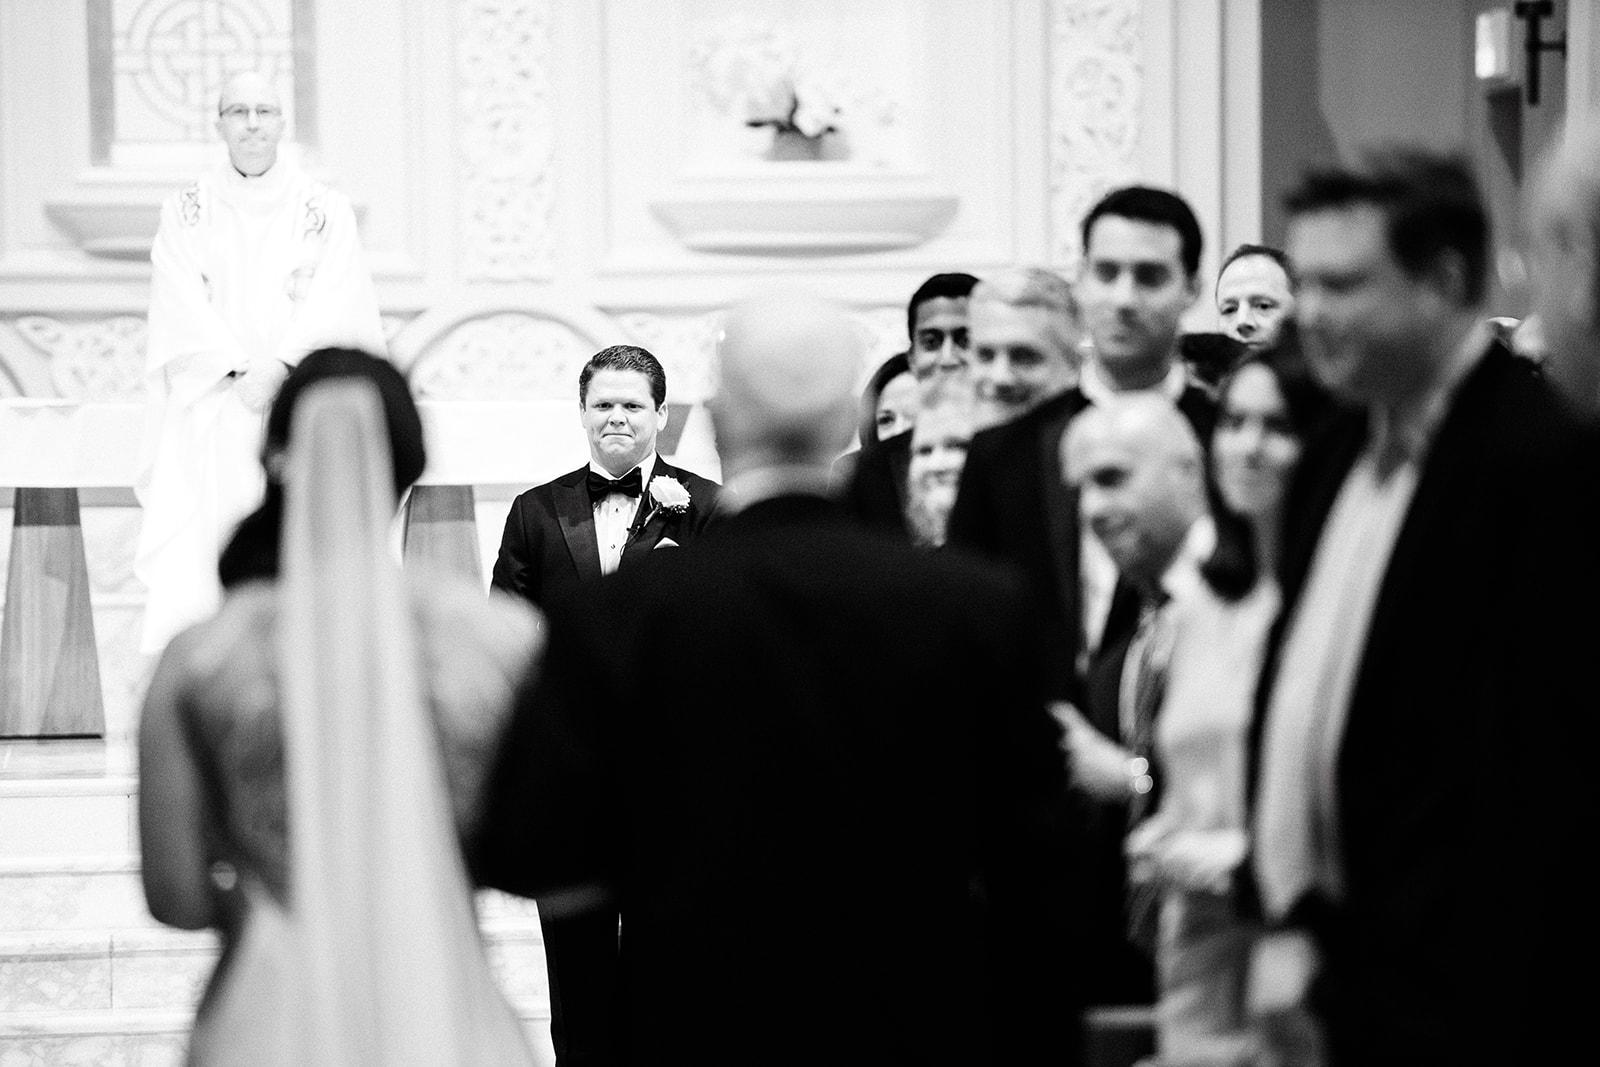 exmoor country club wedding_012.jpg